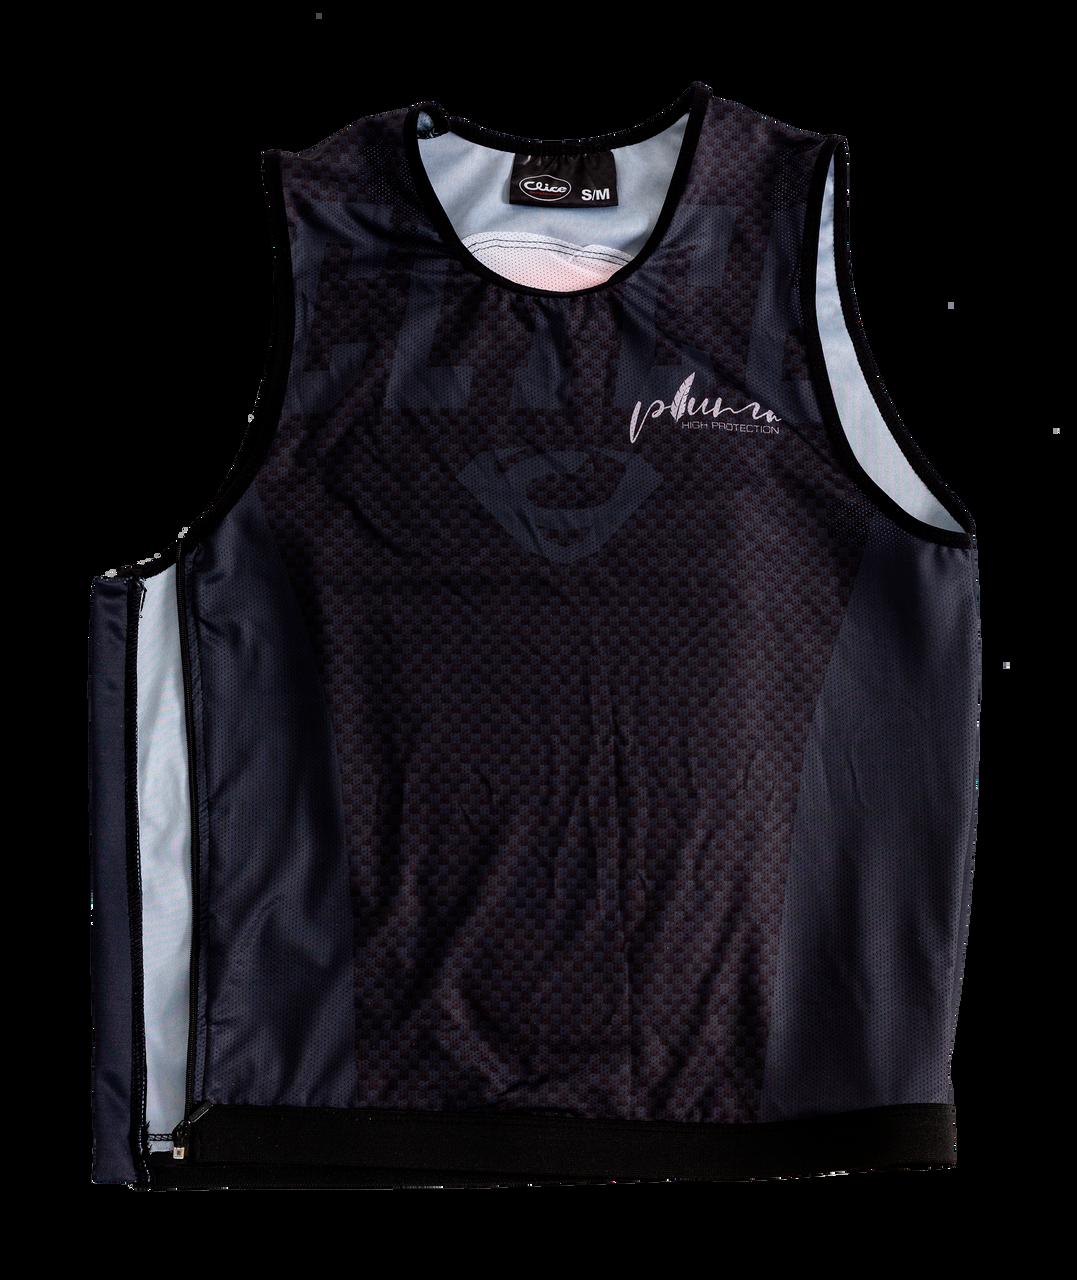 Clice vest back protector